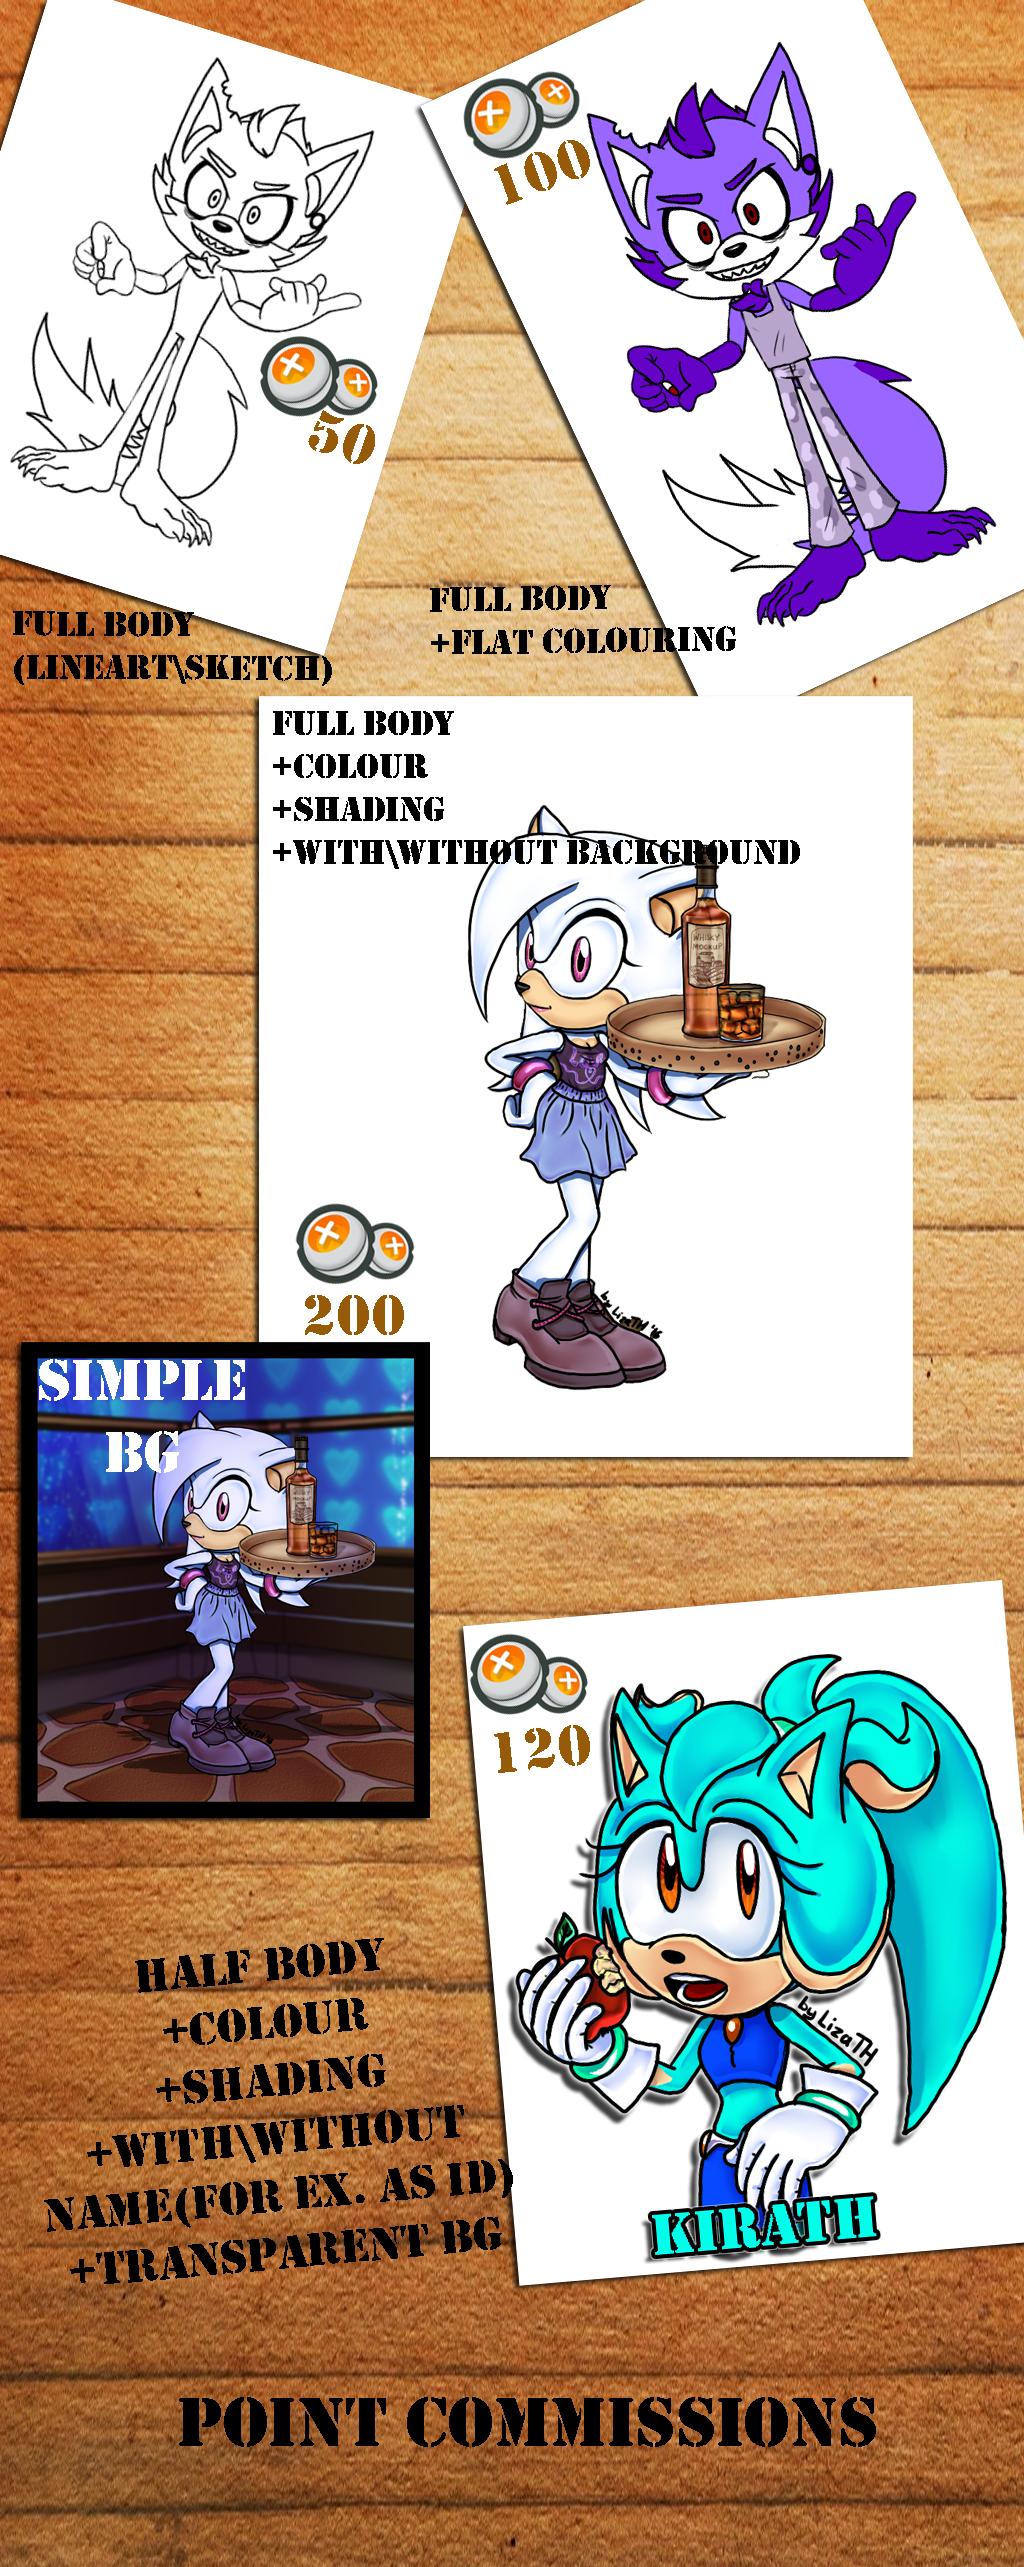 PC pricelist and details by lizathehedgehog